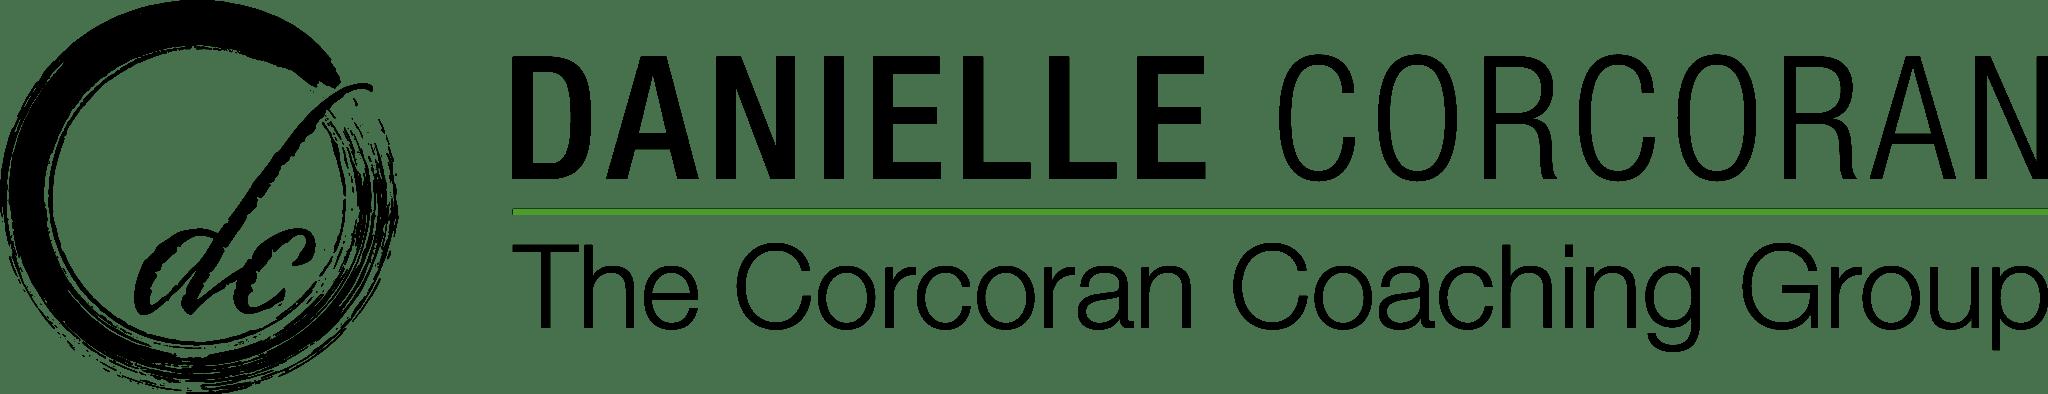 The Corcoran Coaching Group